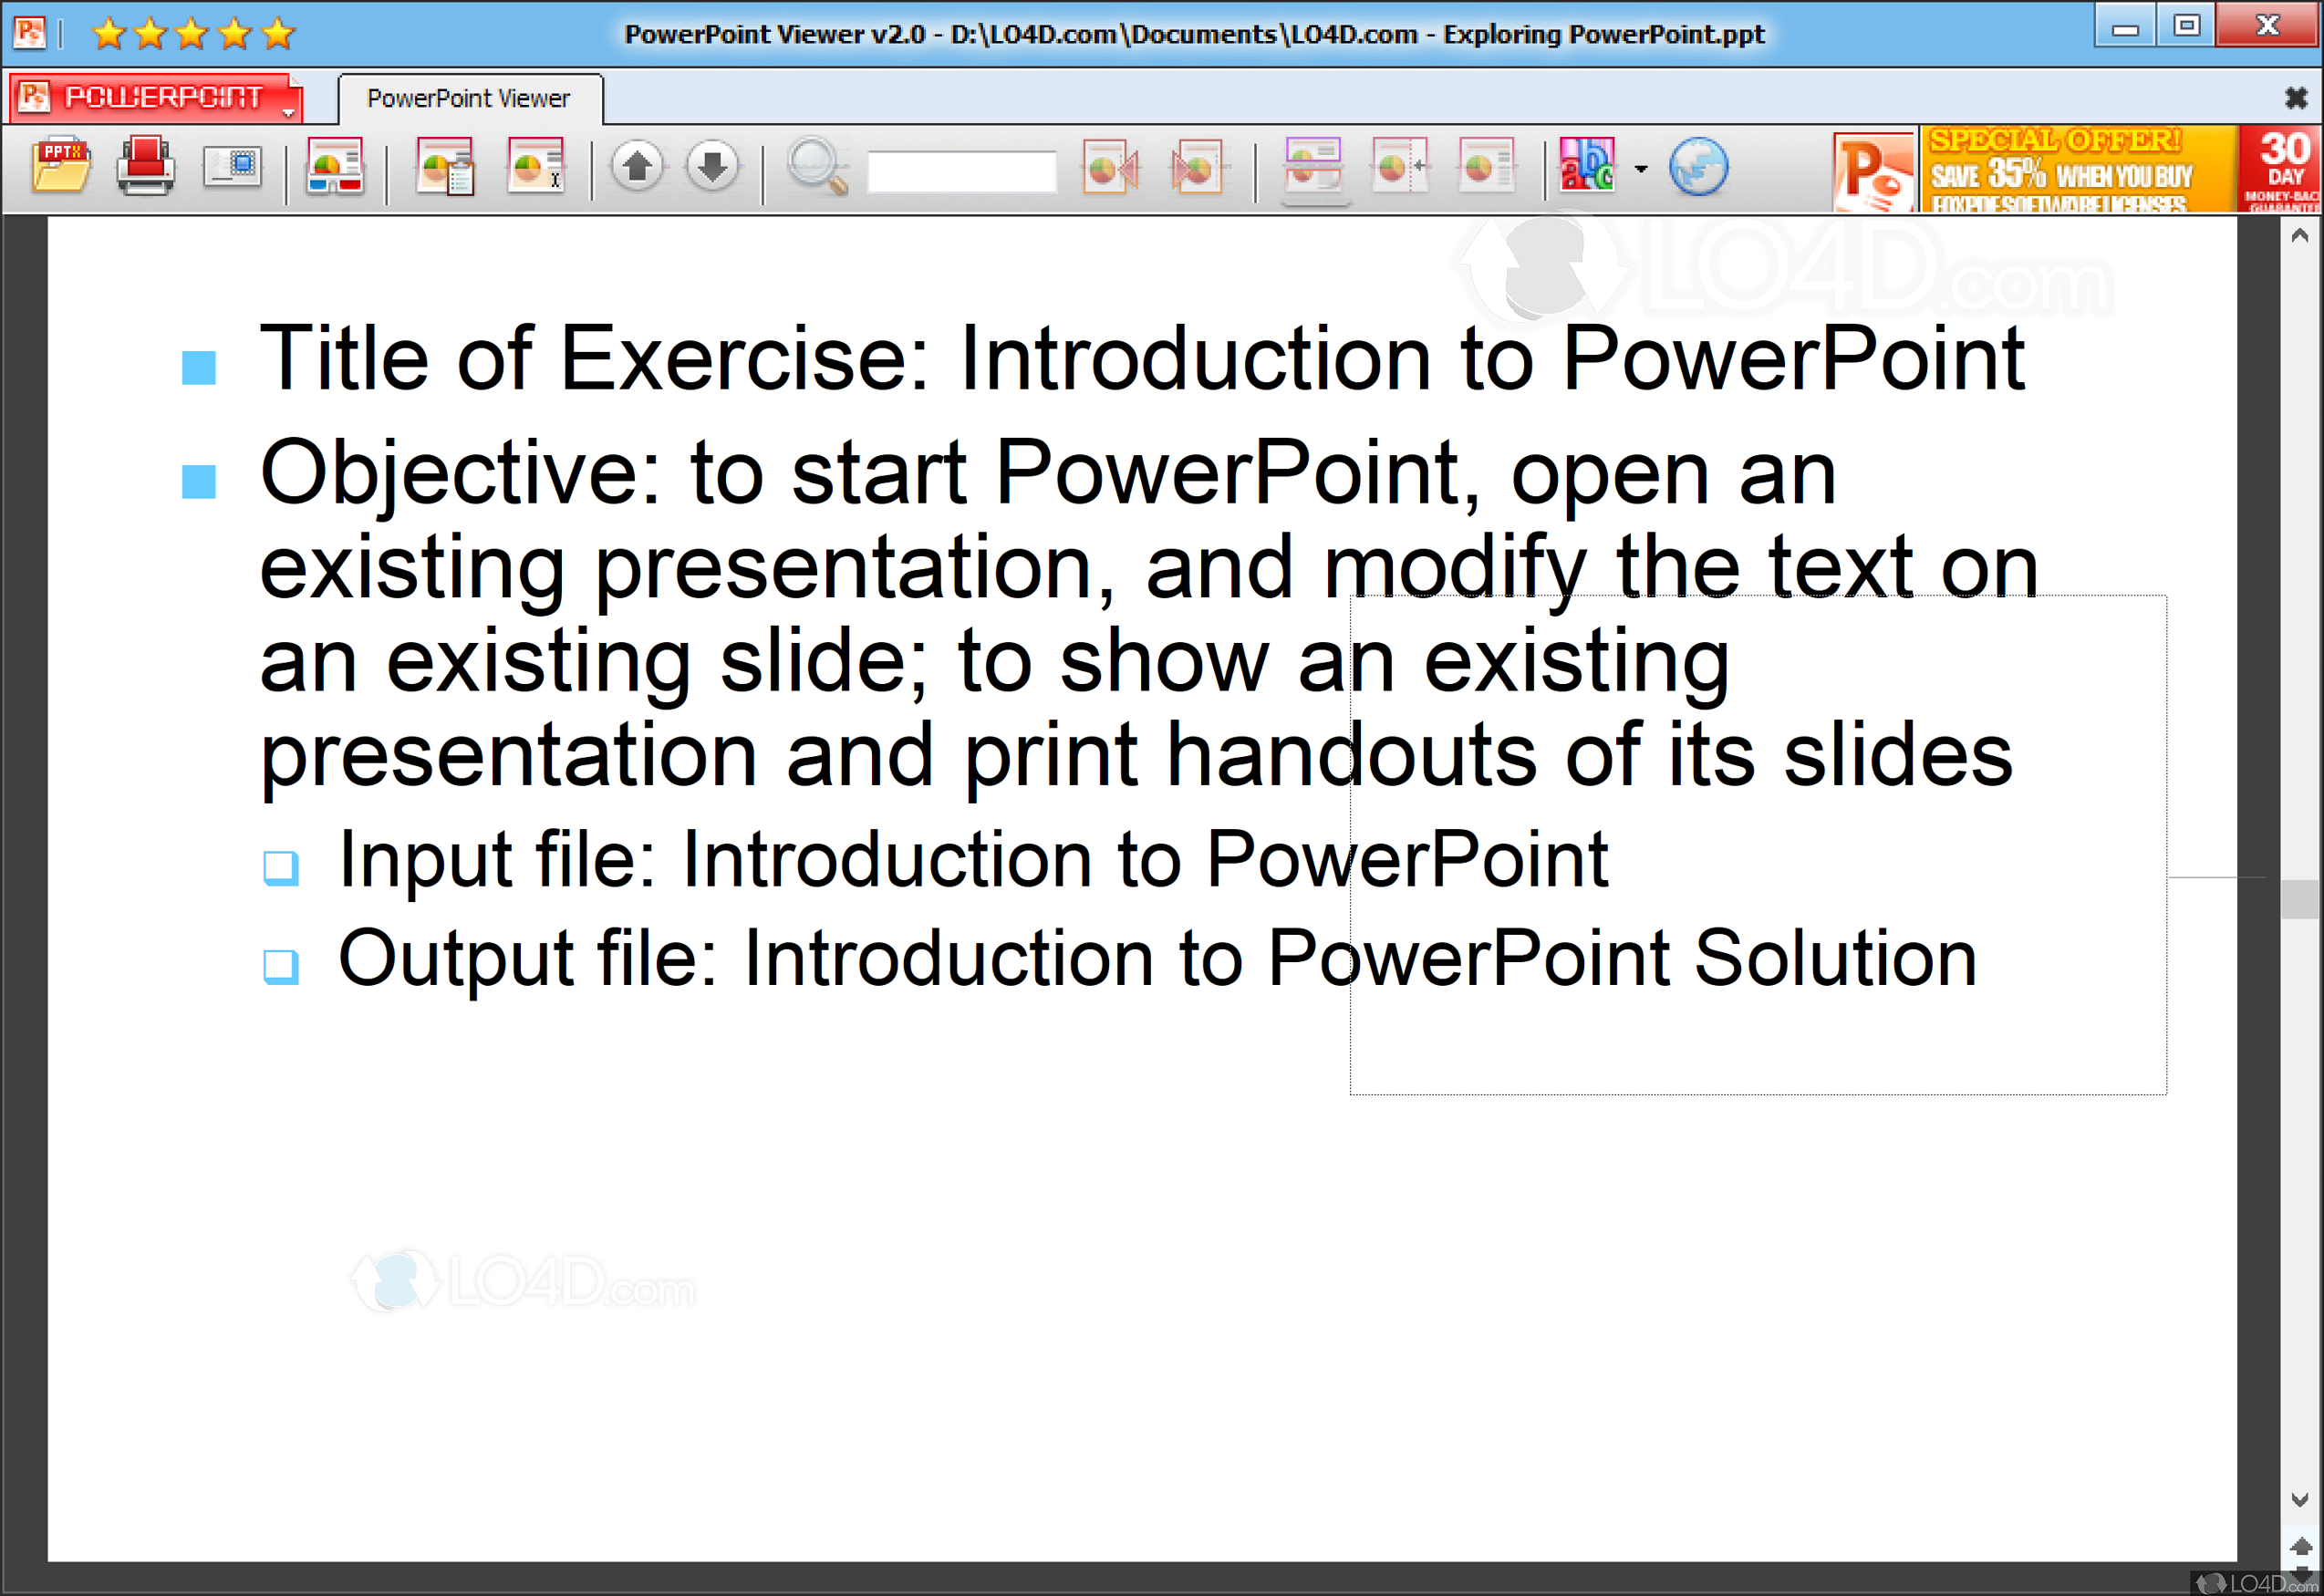 descargar powerpoint 2010 para windows 8